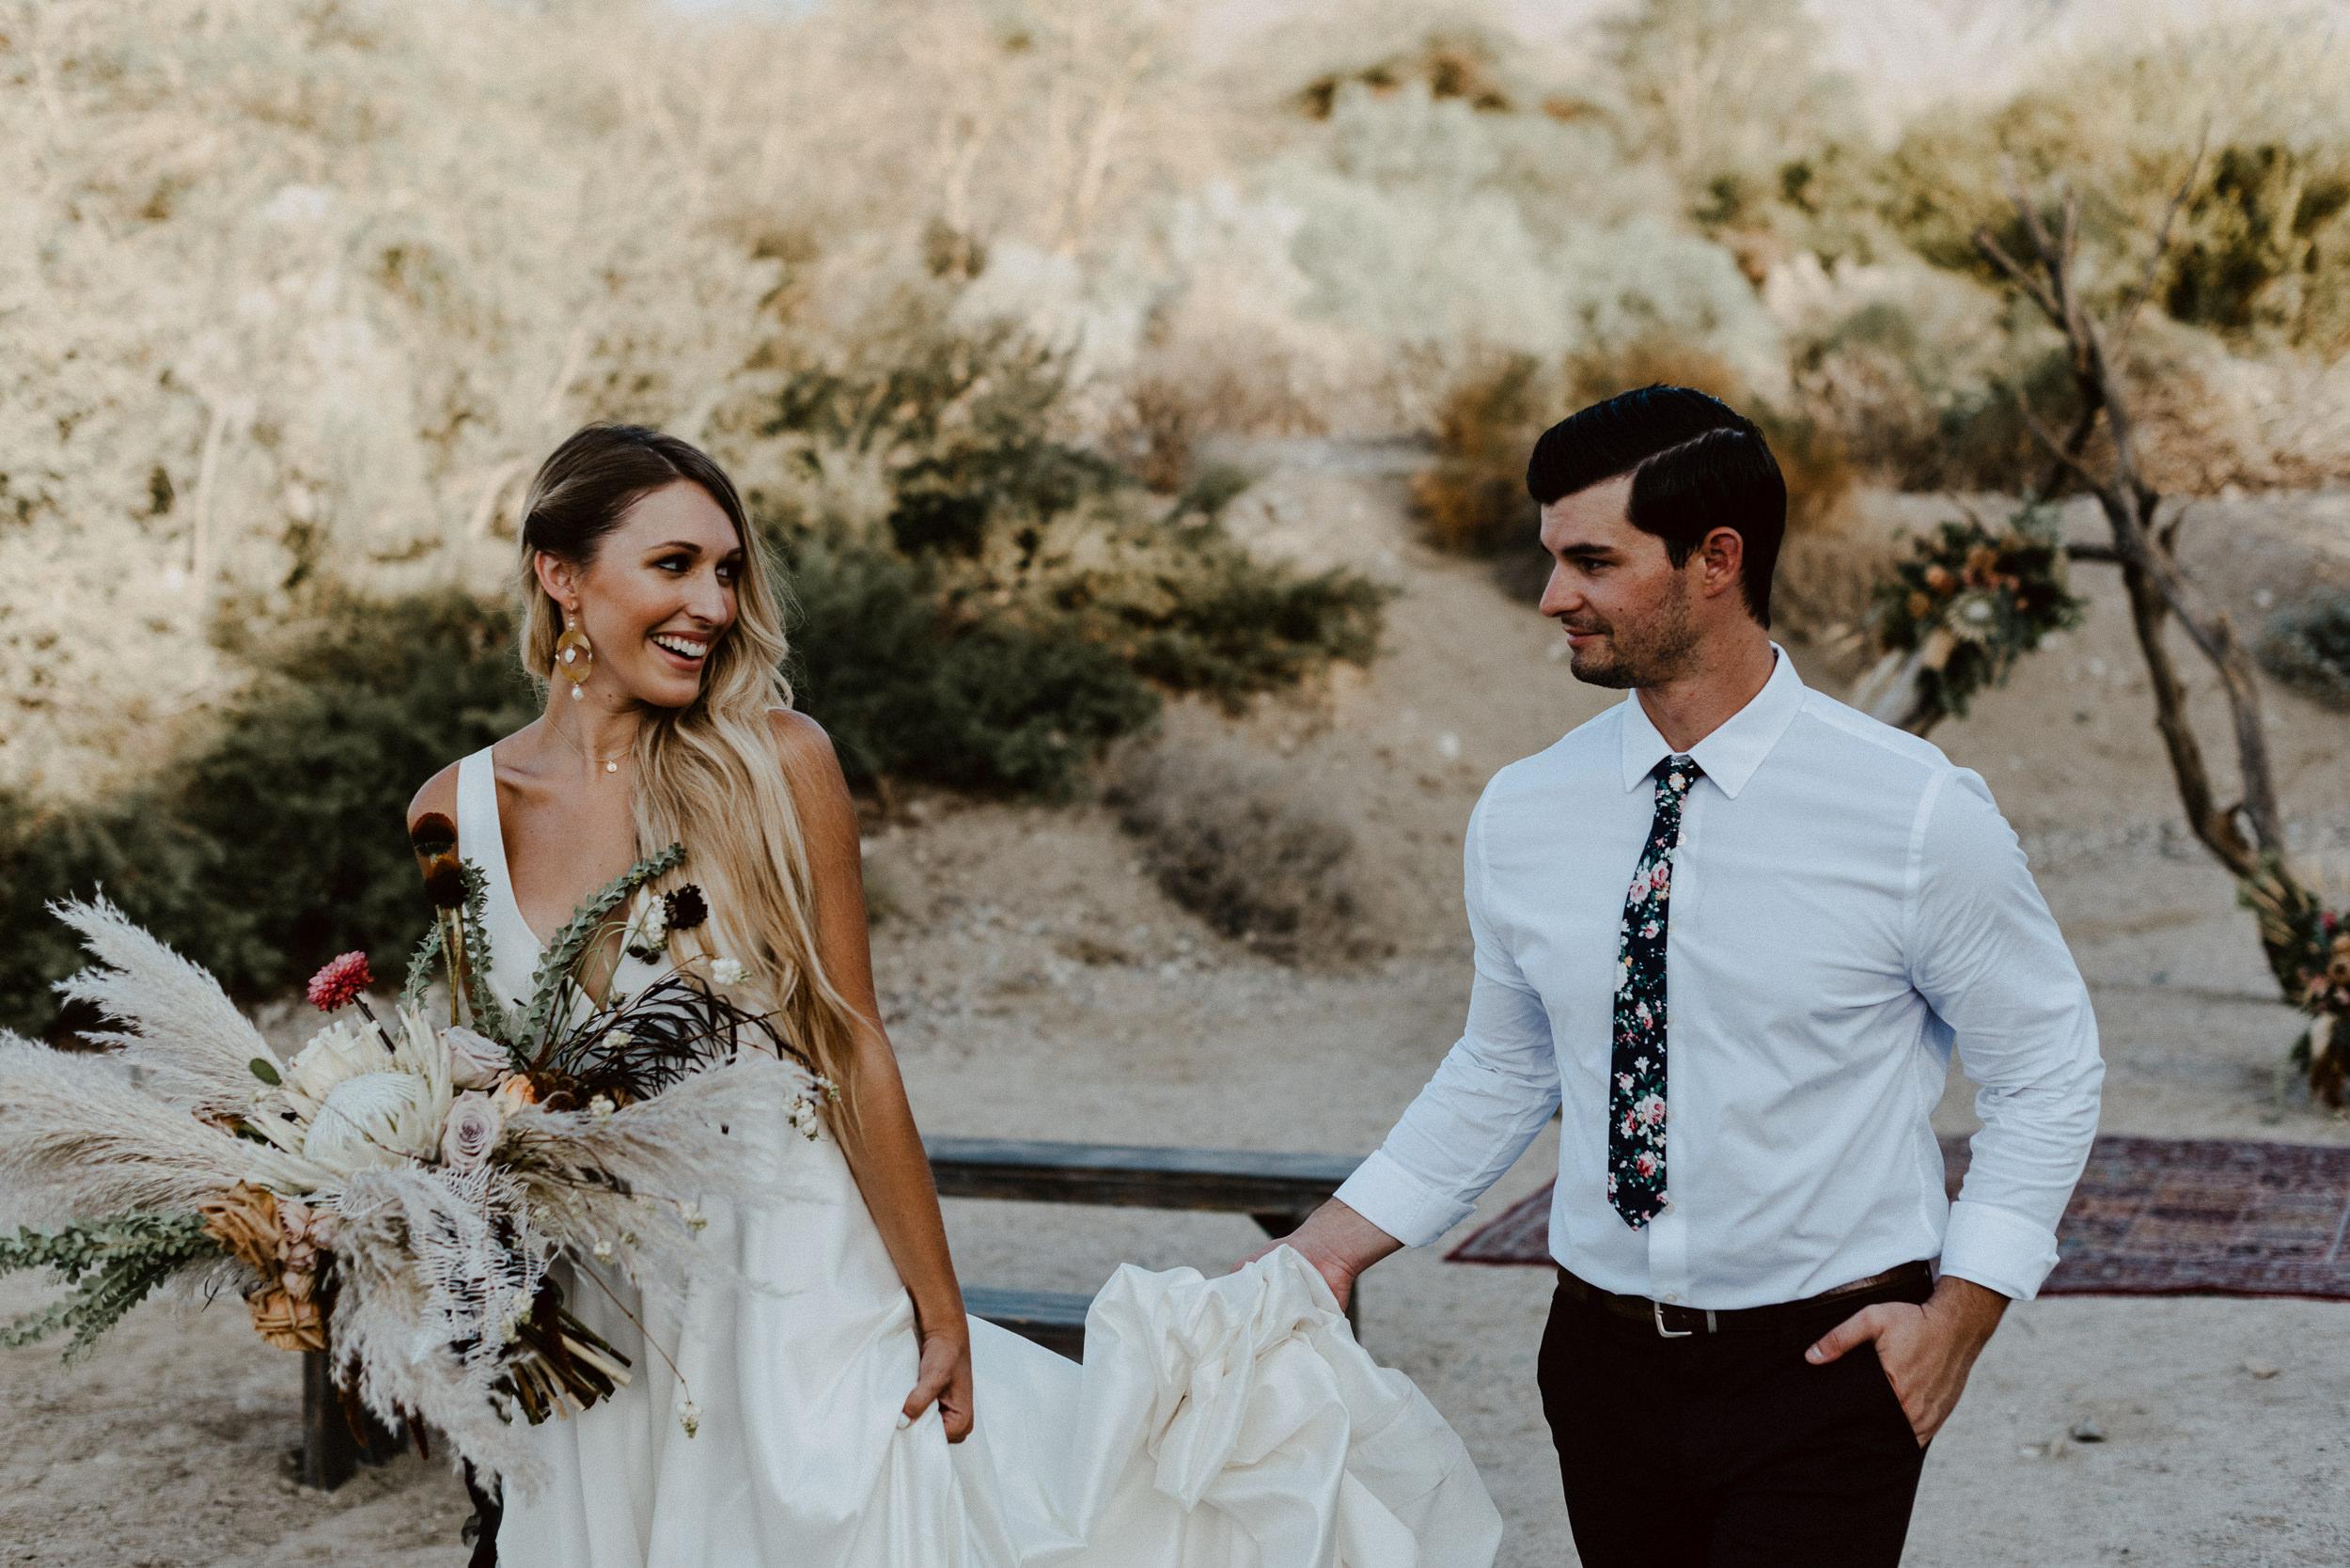 sChelsie + Chris - The Desert Shootout Wedding Romantics at The Living Desert-68.jpg